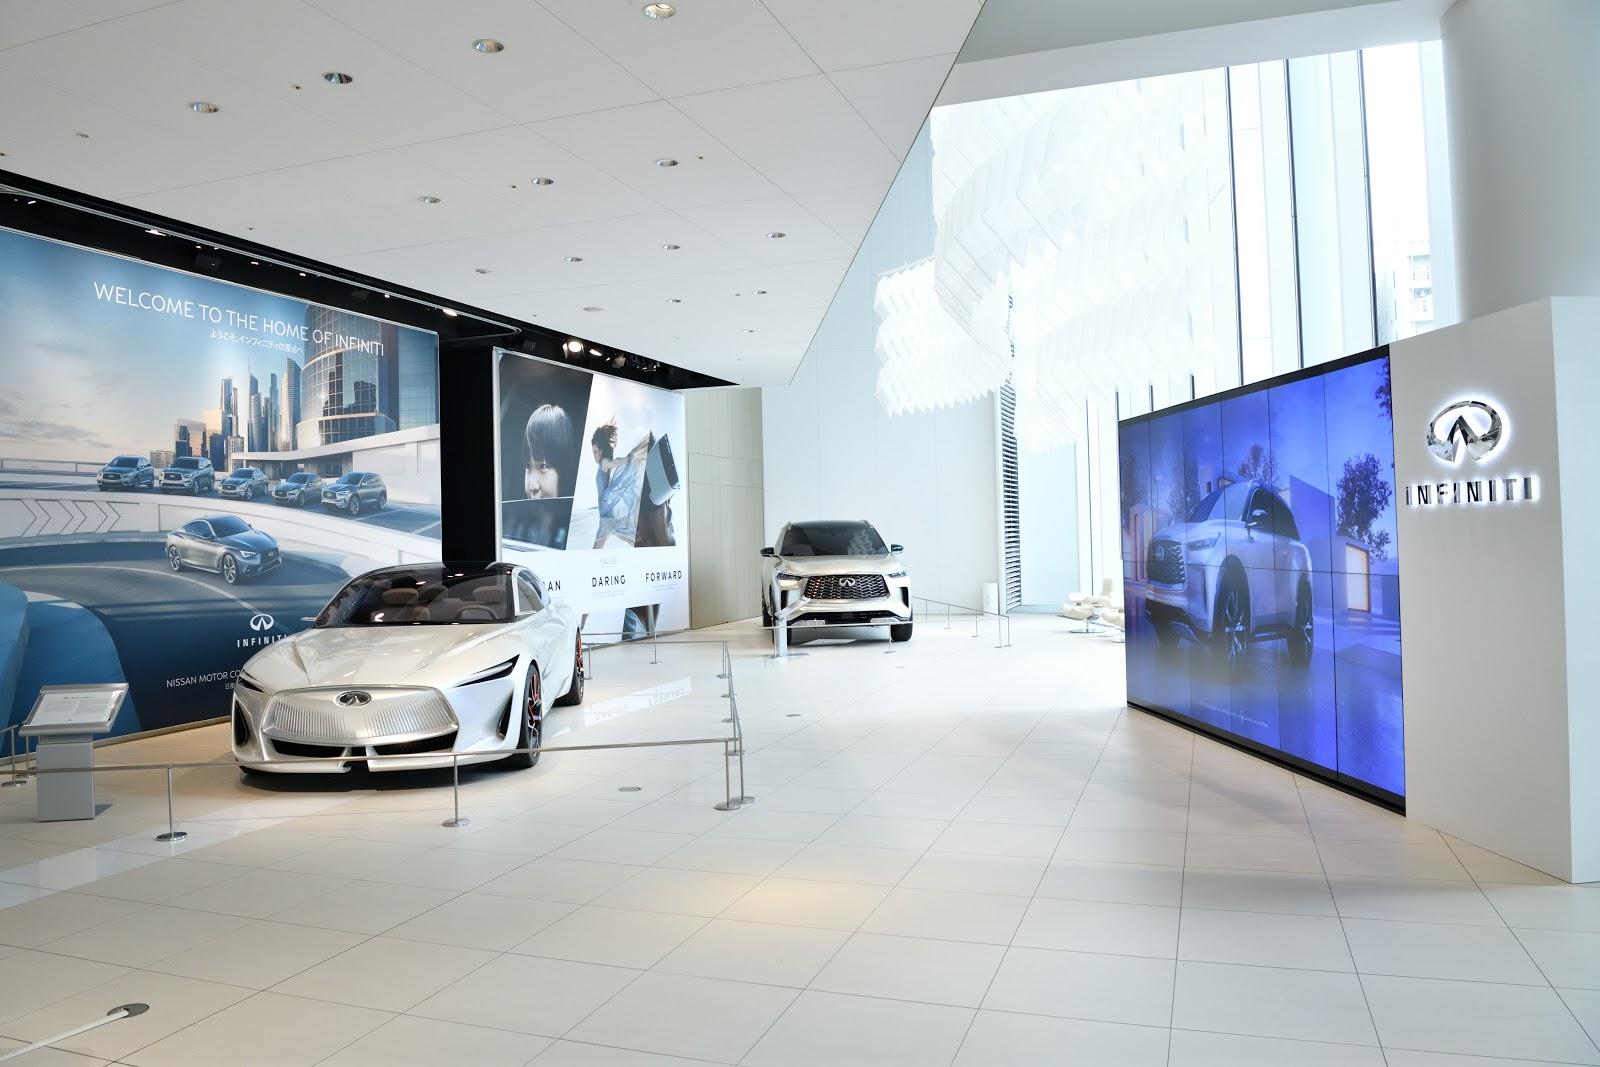 201028 02 infiniti lounge at new global headquarters 23